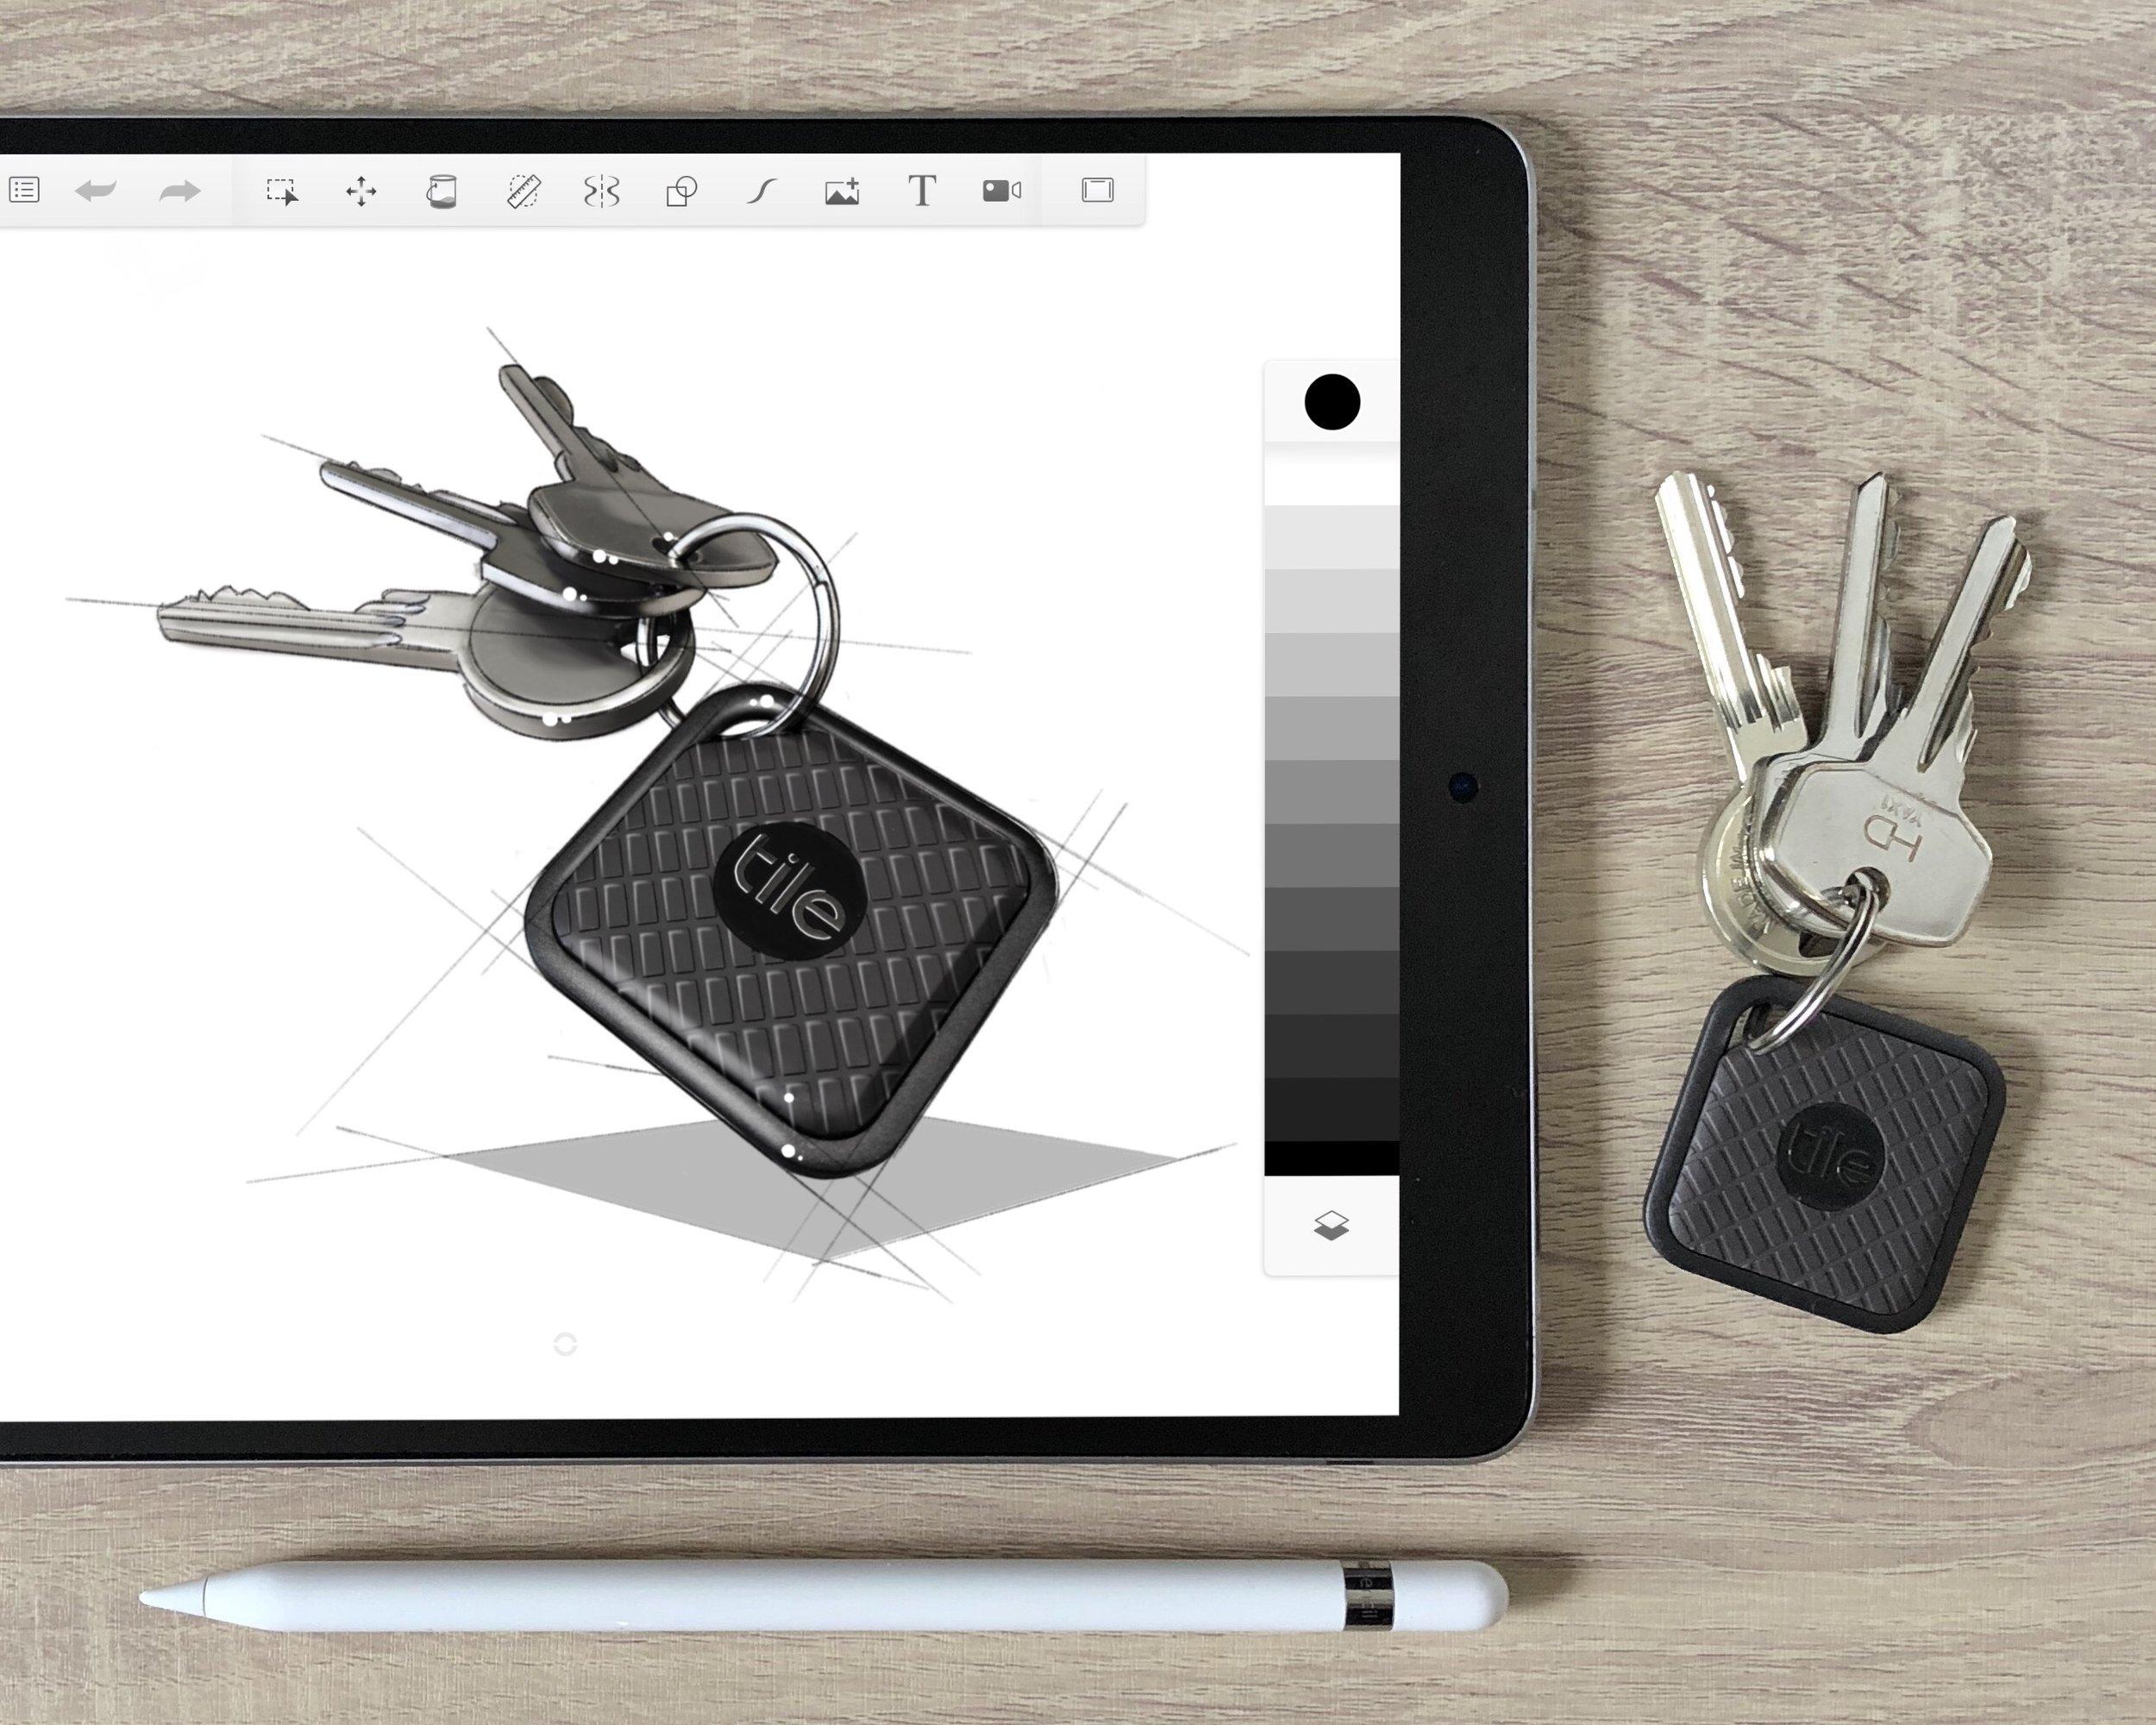 Tile Pro iPad Apple Pencil sketch.jpg